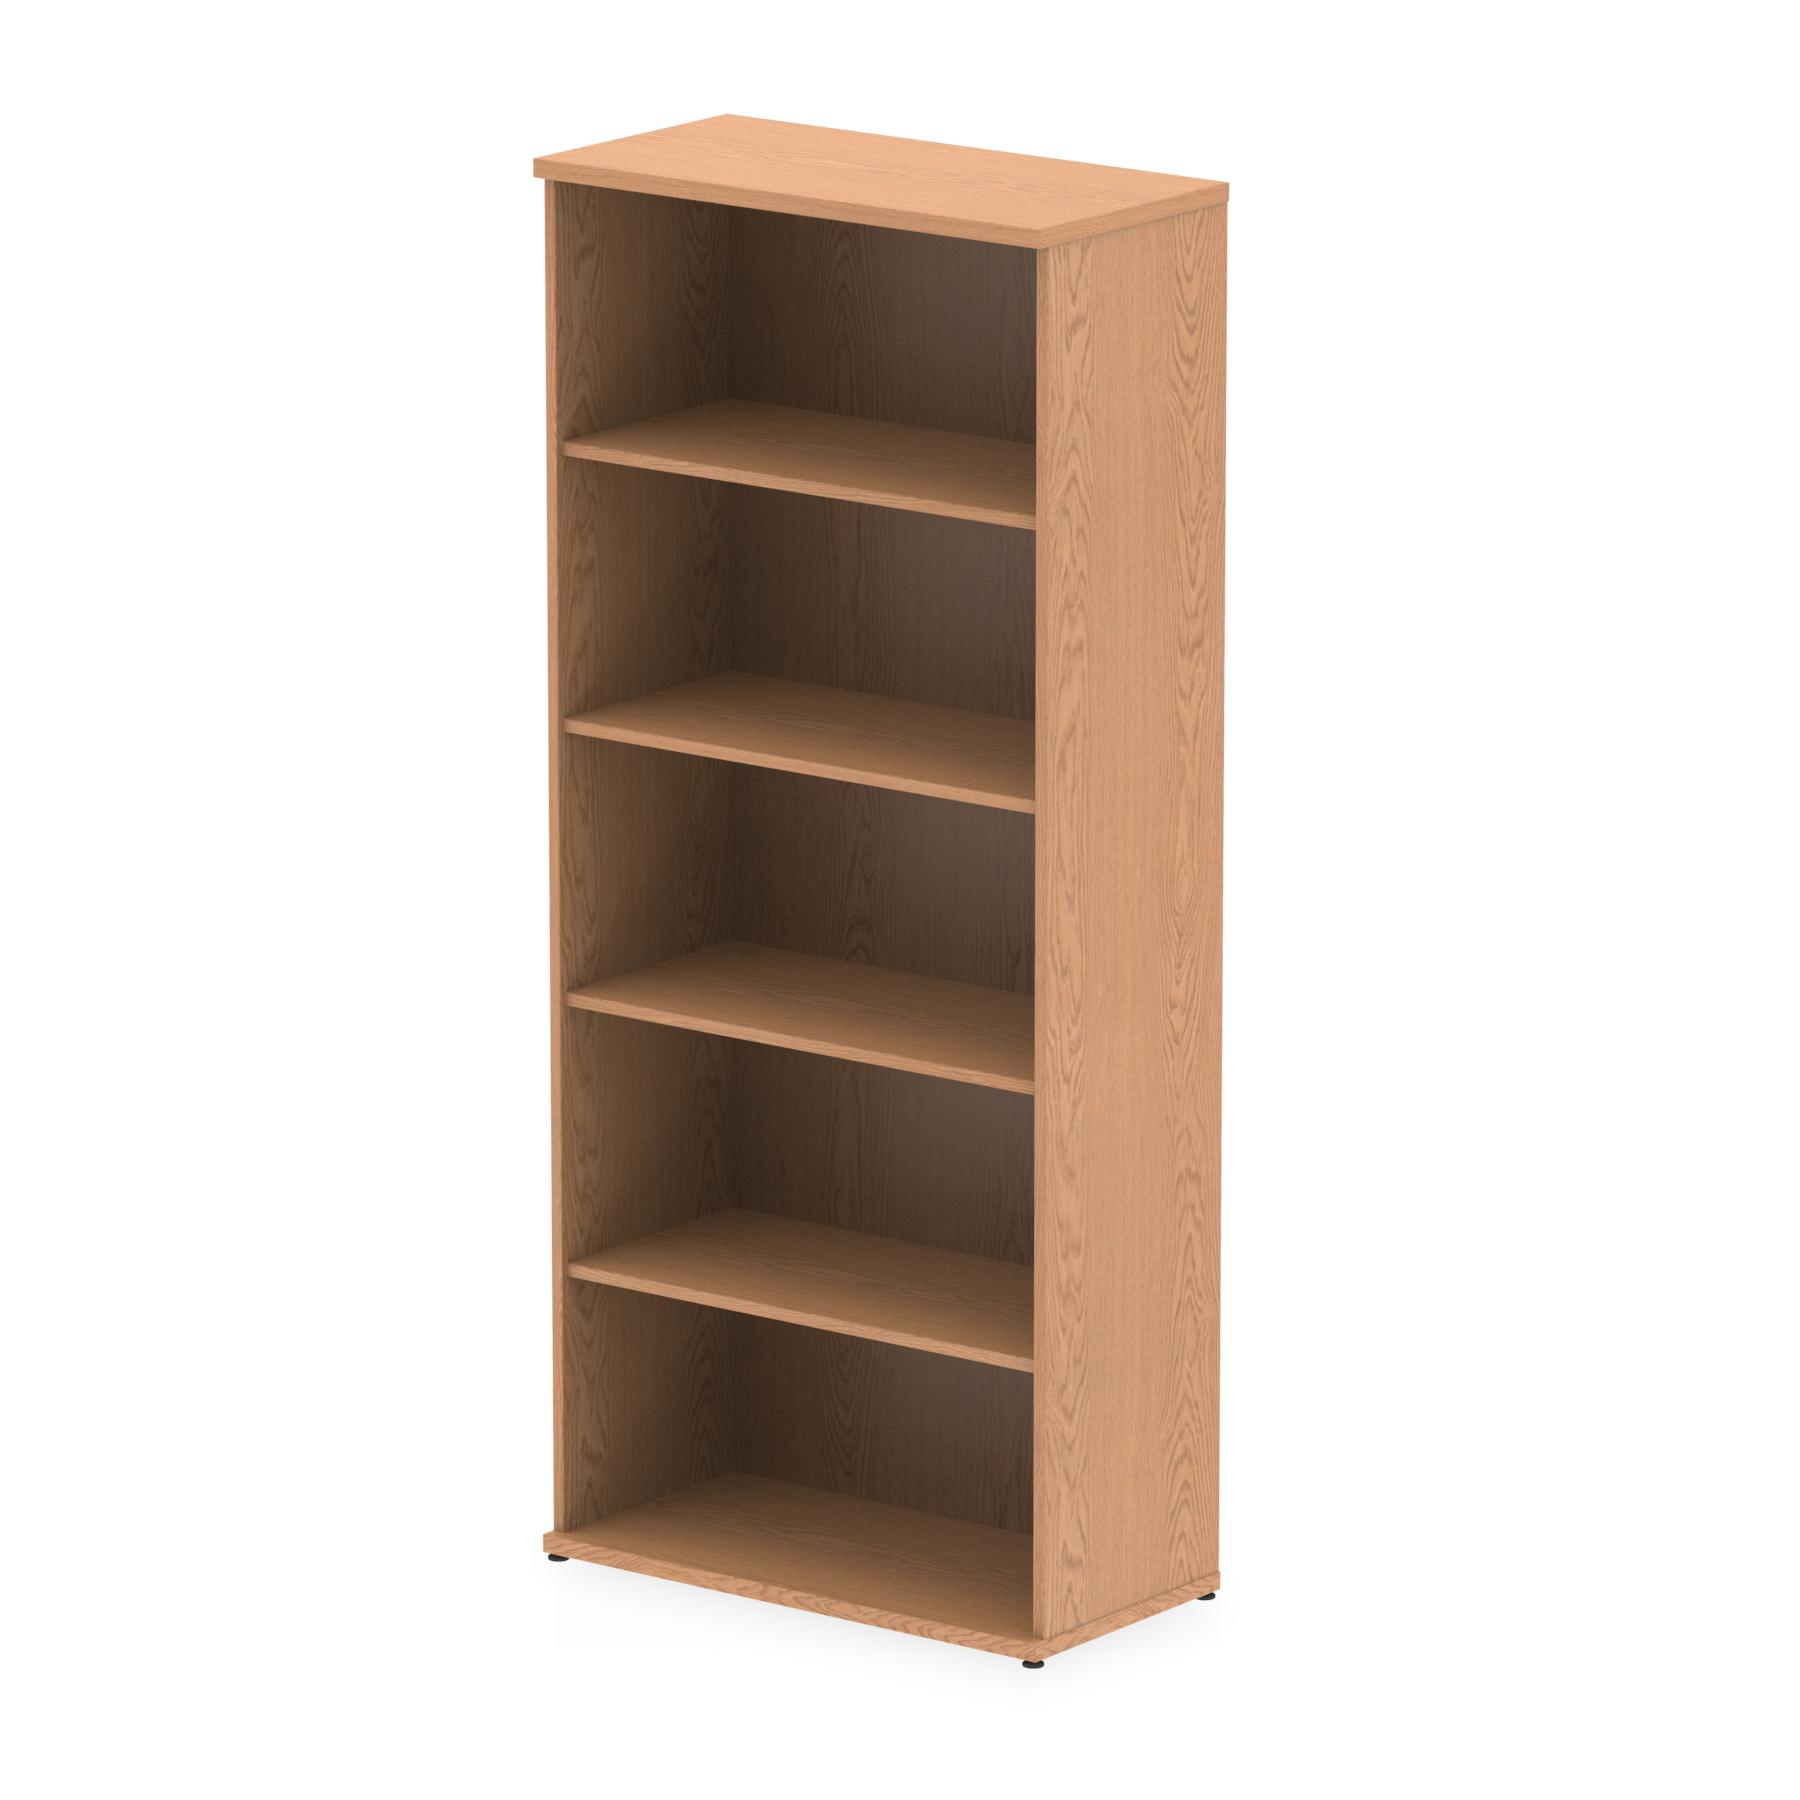 Over 1200mm High Impulse 2000mm Bookcase Oak I000760